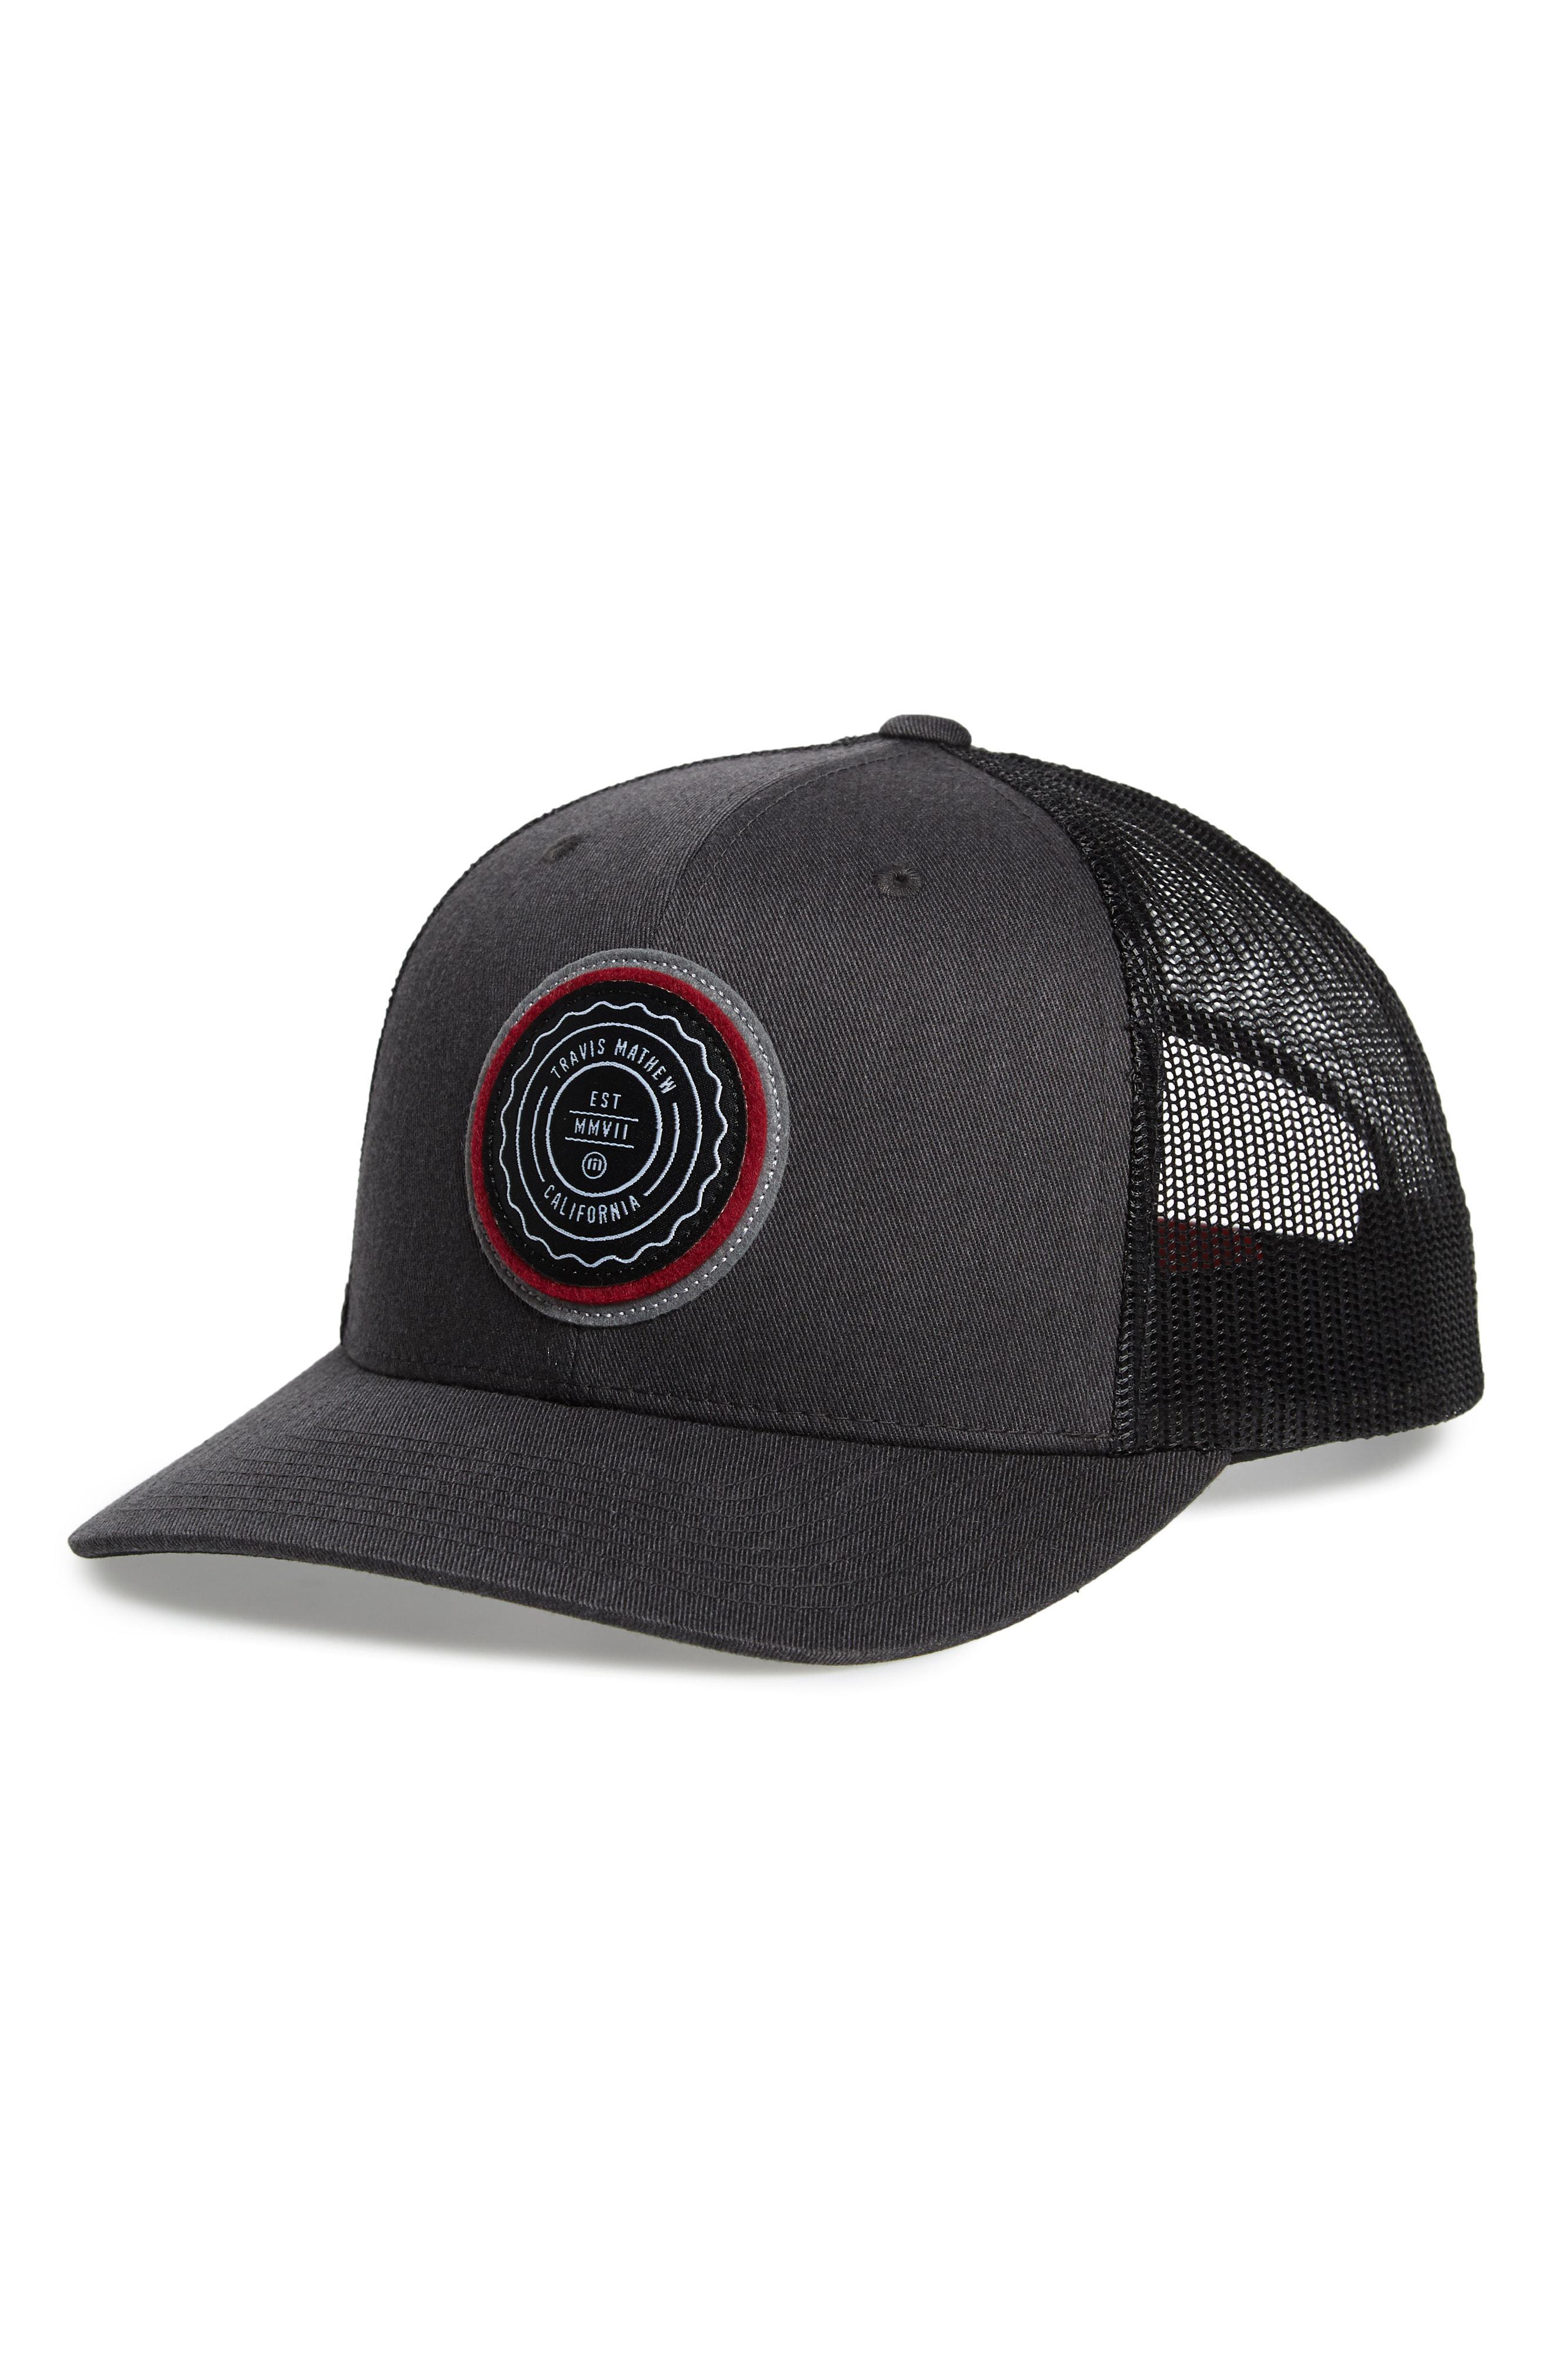 2ac6a09e9 ... official lyst travis mathew trip trucker hat in black for men jpg  2640x4048 travis mathew trucker